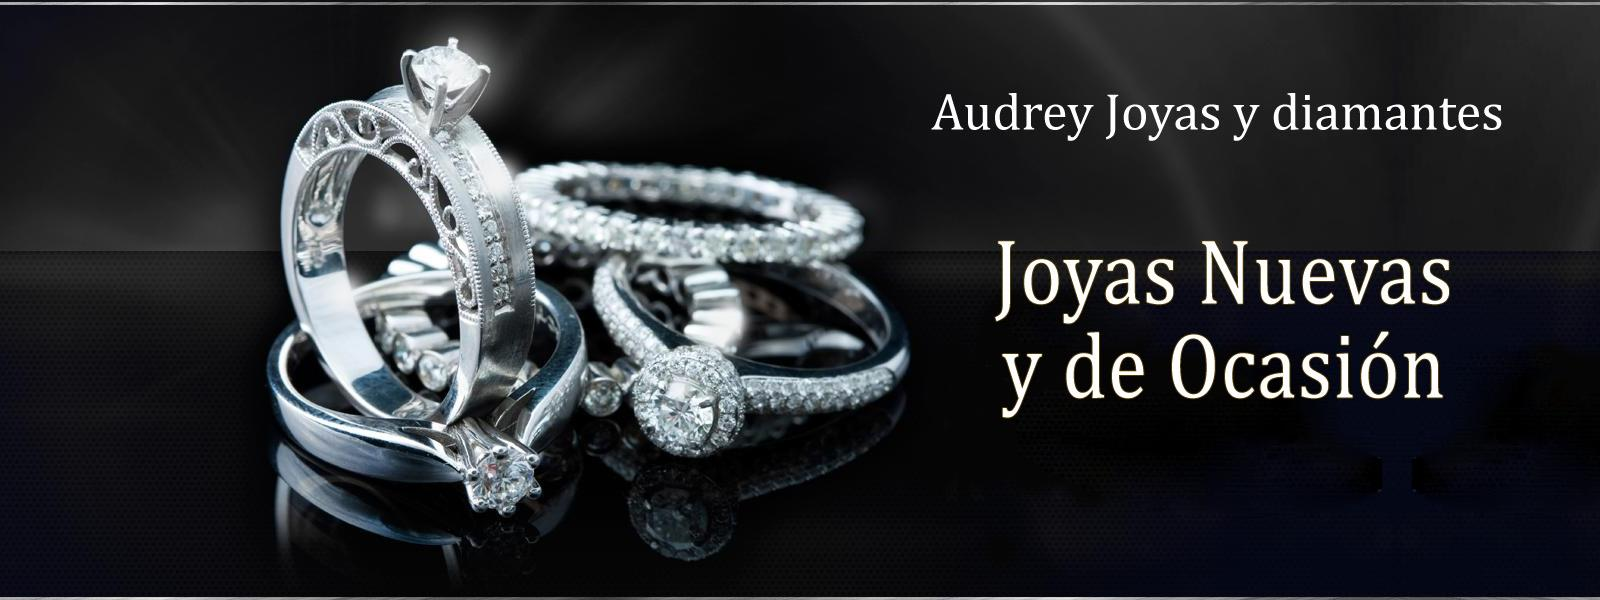 43b35c4ab85a Compra-Venta de joyas